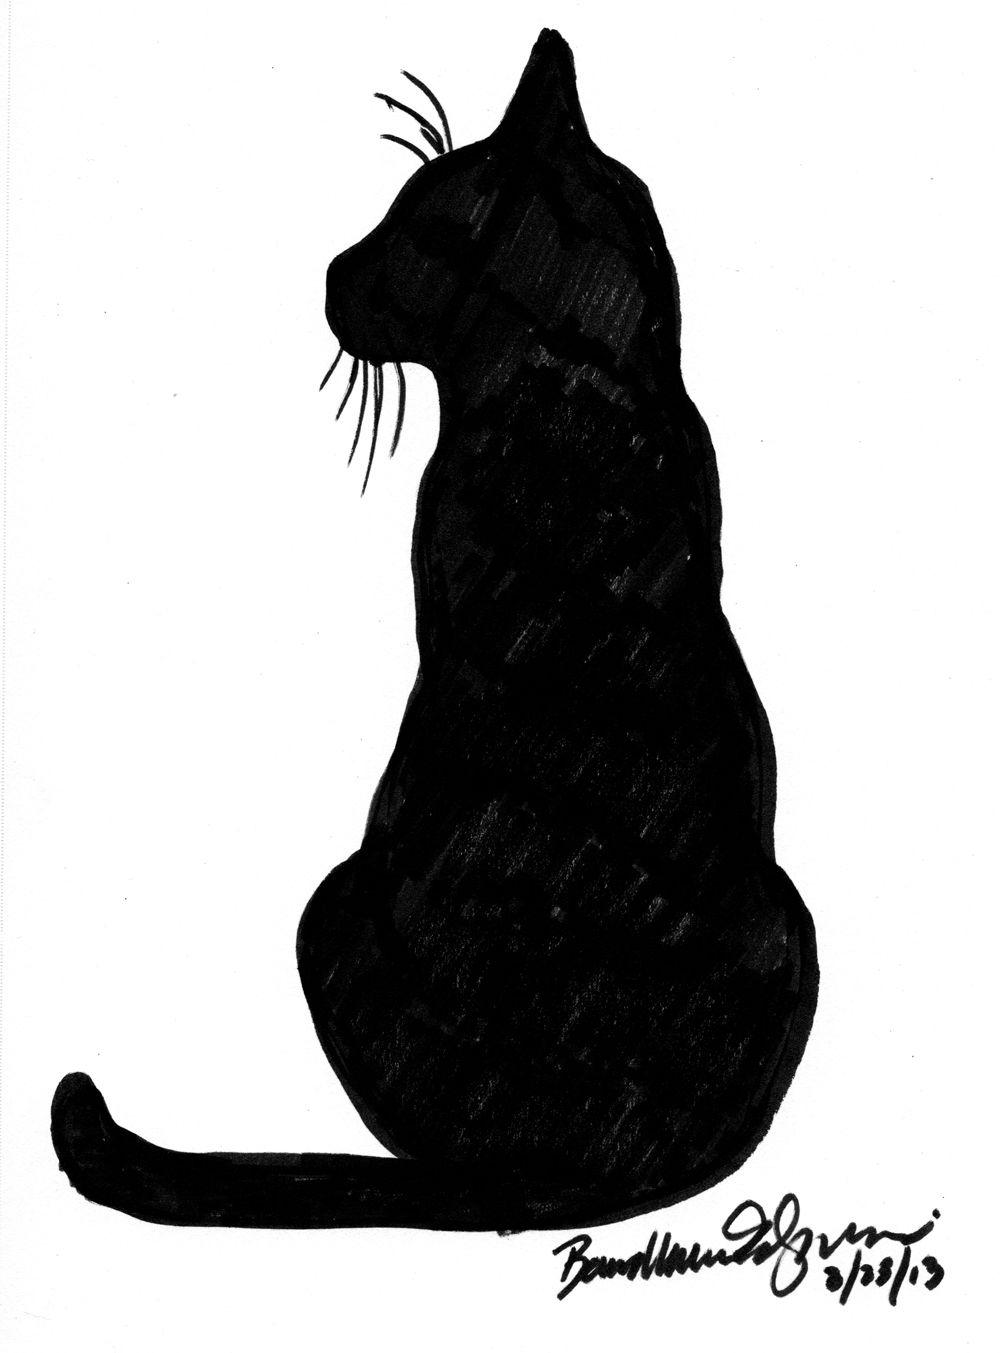 black cat silhouette tattoo - Google Search